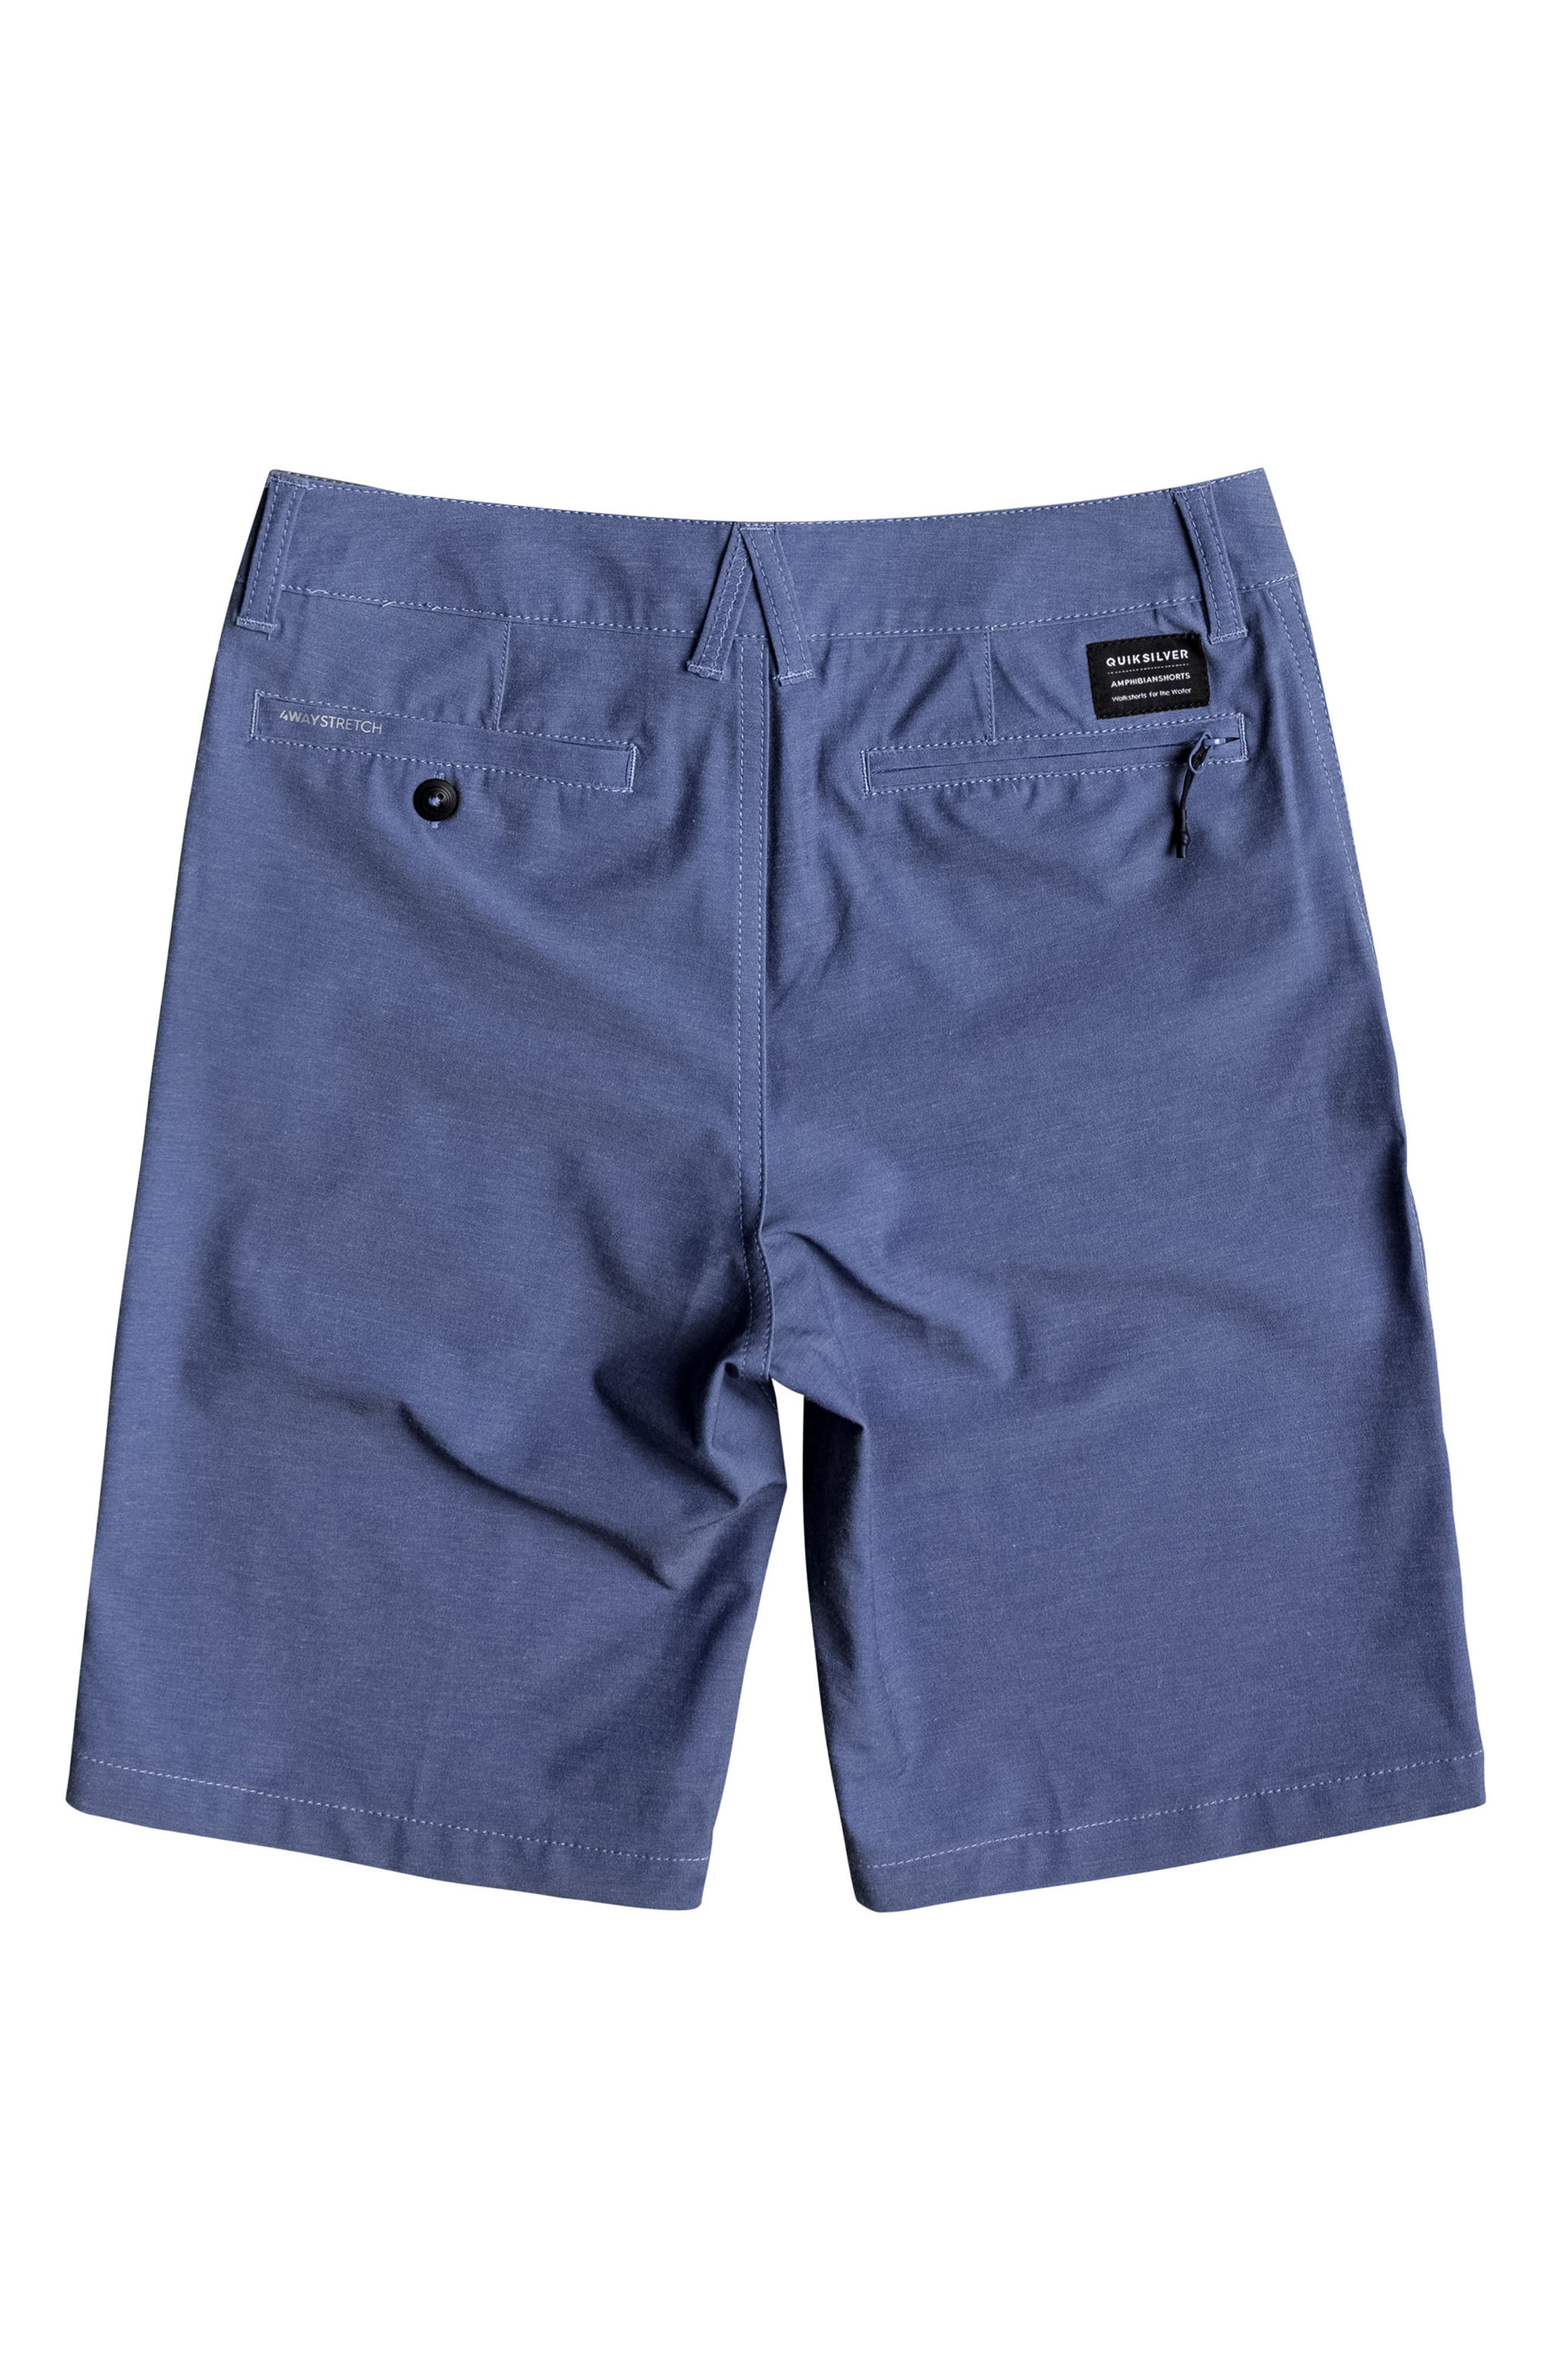 Amphibian Hybrid Shorts,                             Alternate thumbnail 2, color,                             417